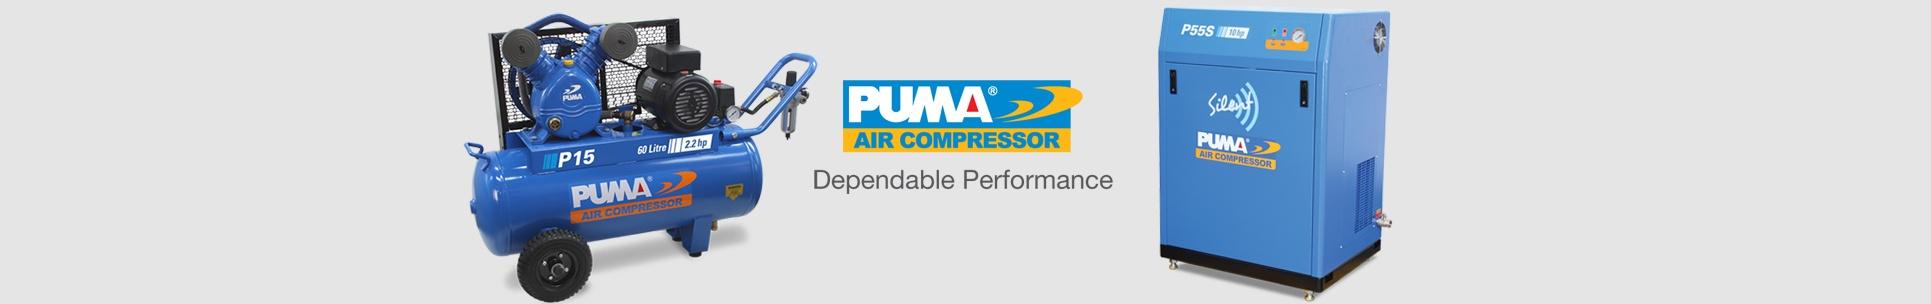 Glenco Banner Image-Puma